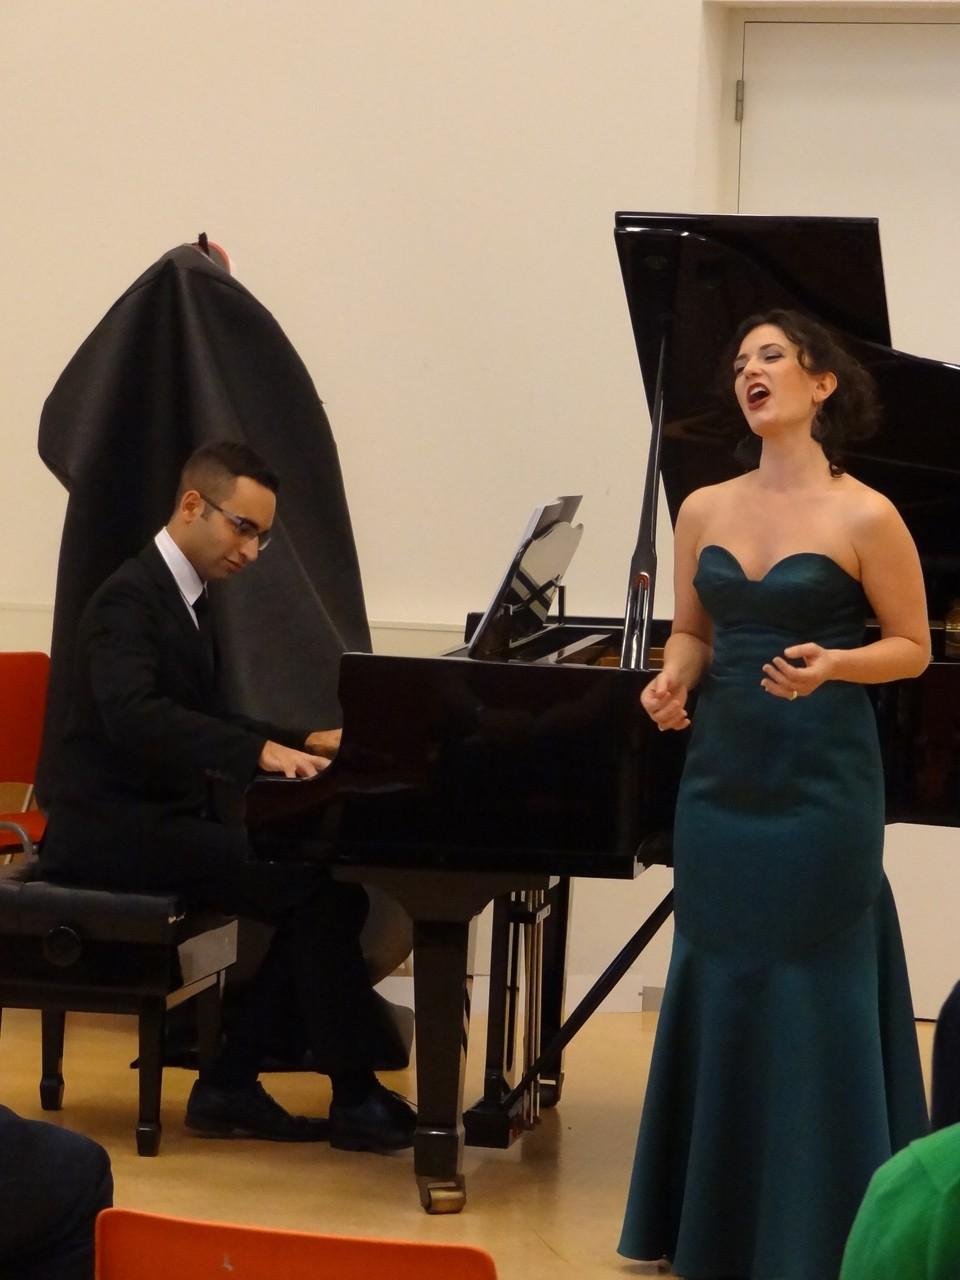 Duo Vert Obscur - EPO private concert